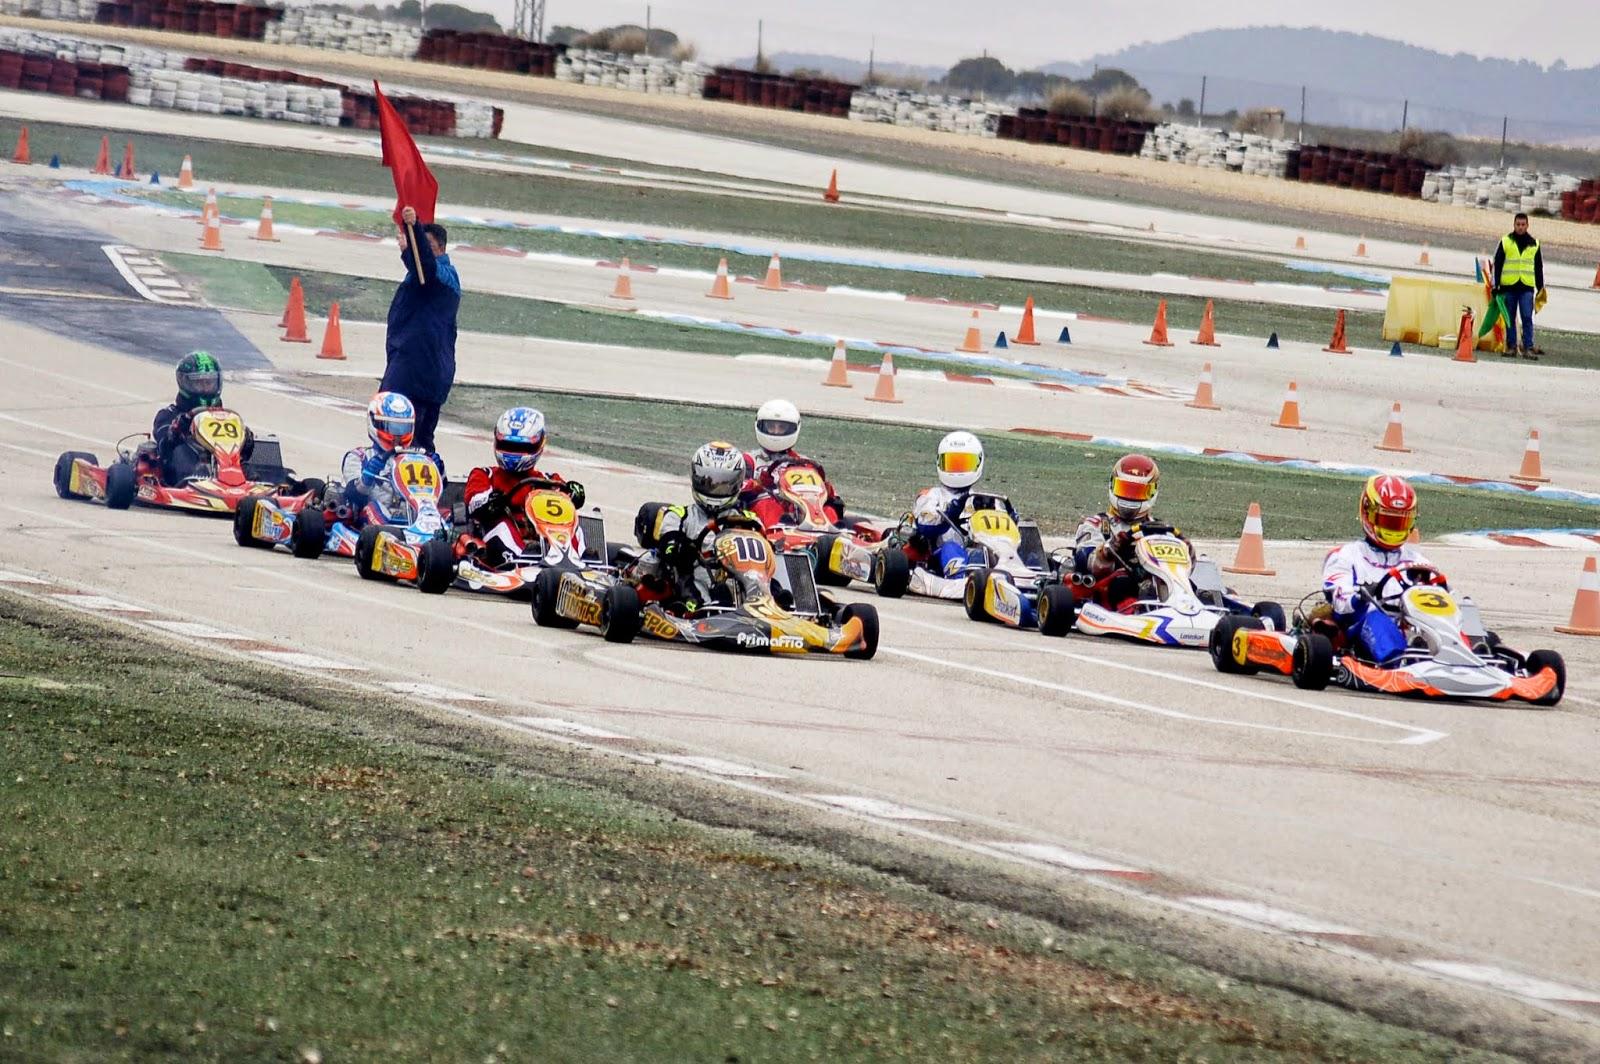 Circuito Jumilla : Benferri karting club: cronica. 2ª prueba campeonato murciano de